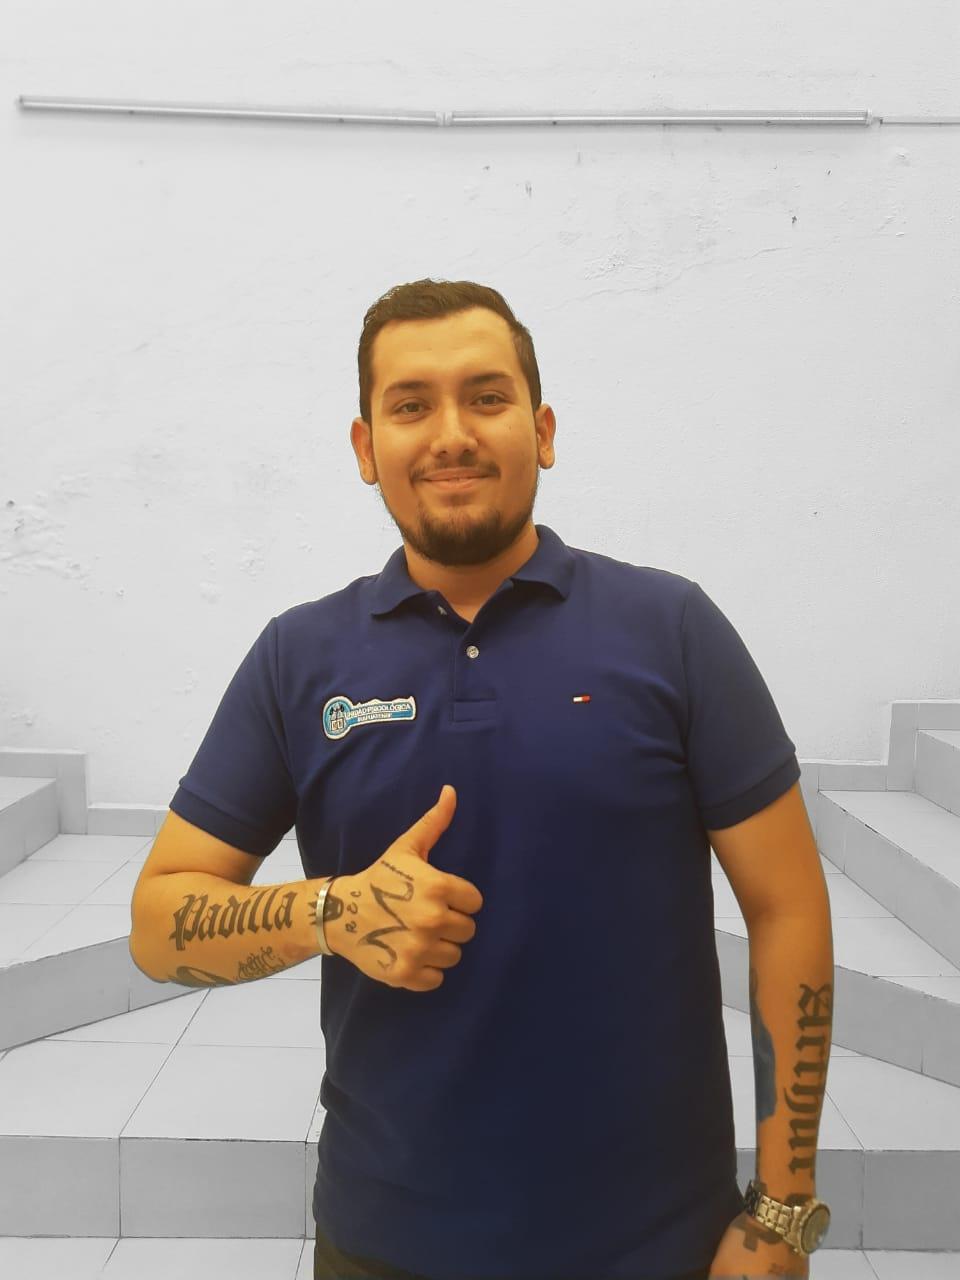 Luis Arturo Barbosa Aguilar